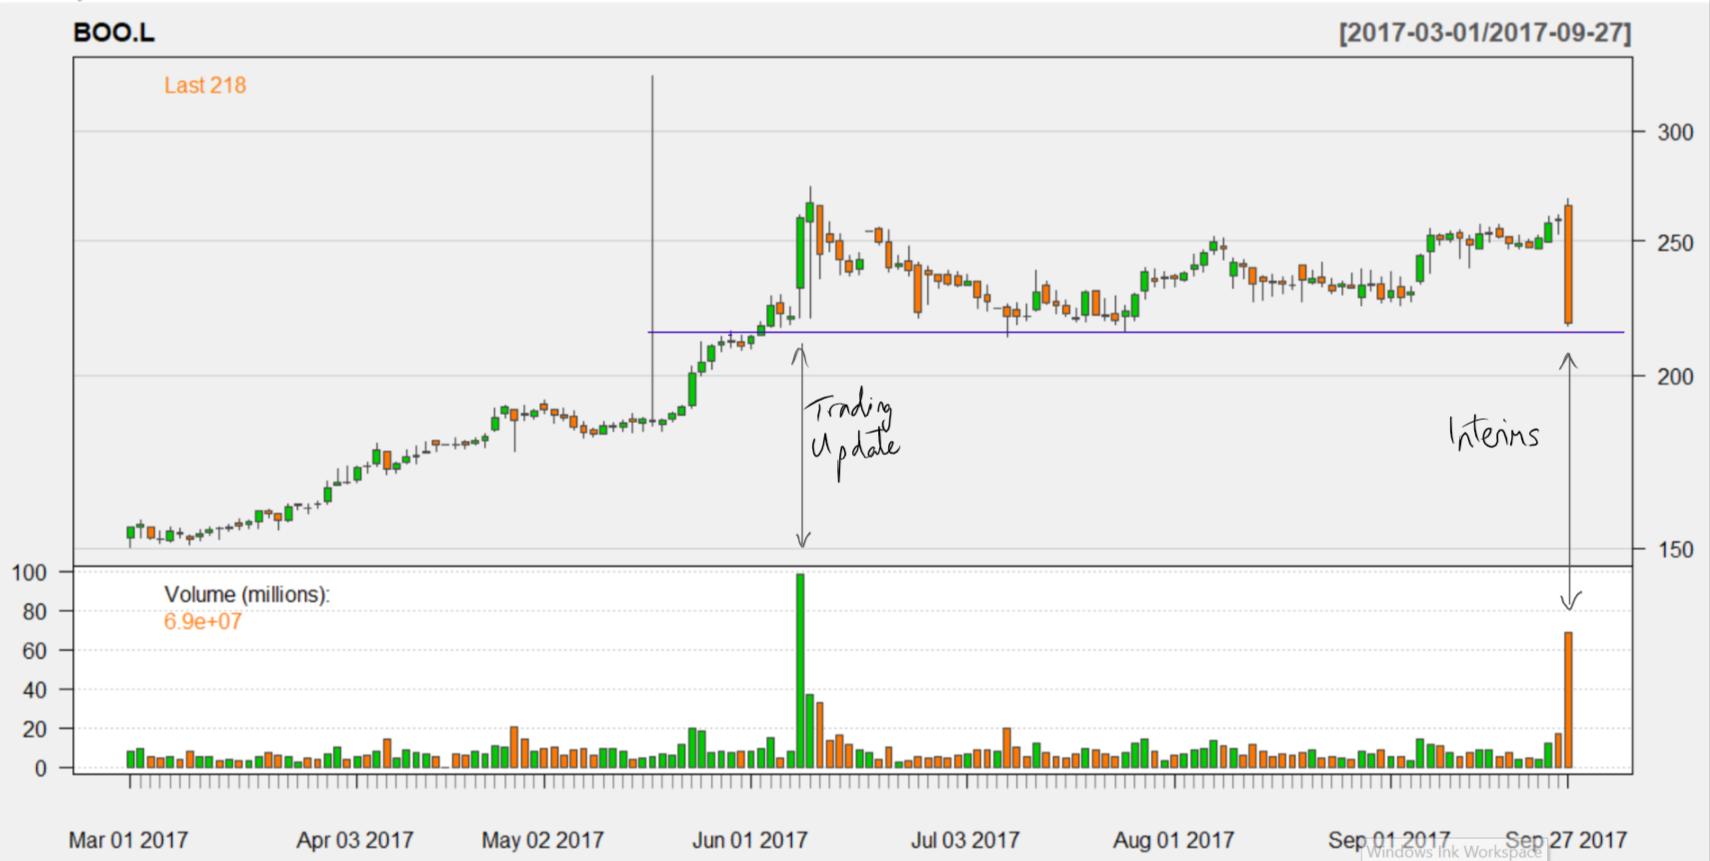 59cc25724bcc3boo-chart.png